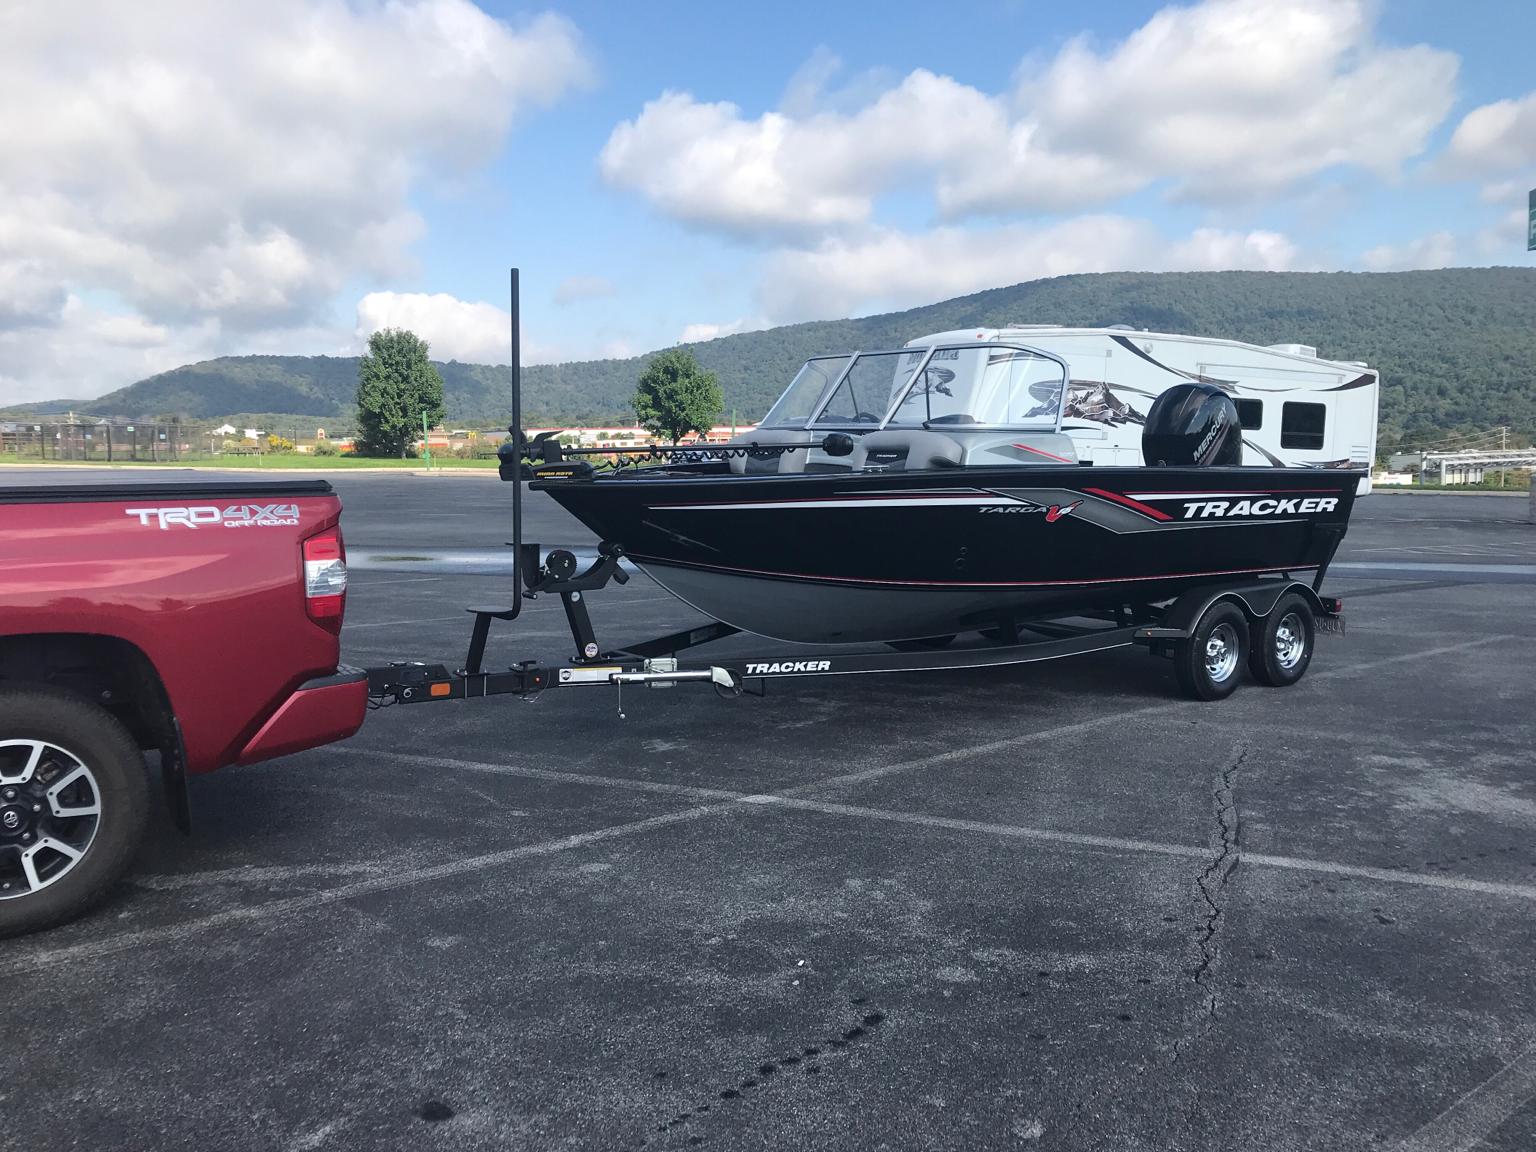 2018 Tracker Targa V-18 WT setup - This Old Boat - Lake Ontario